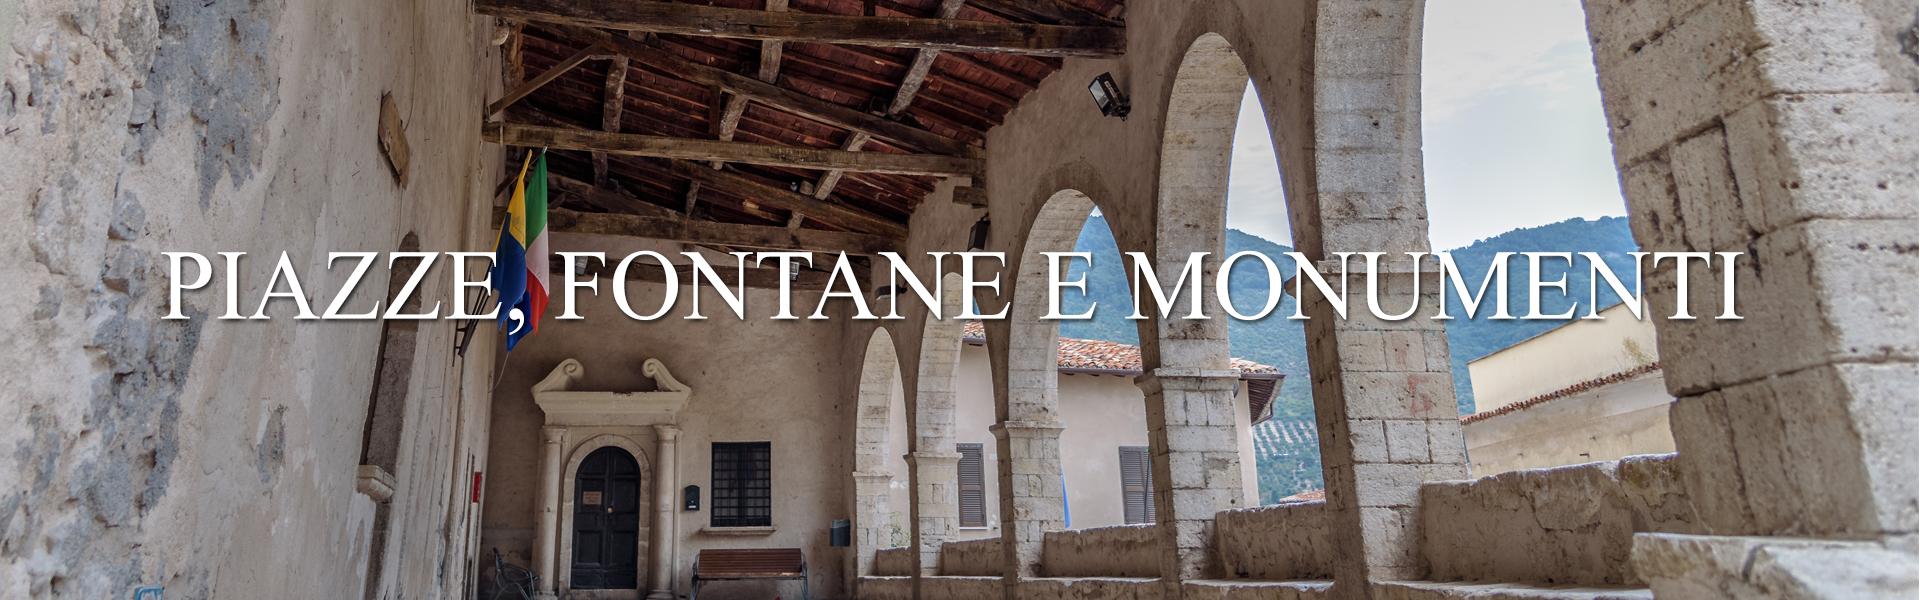 piazza-fontane-monumenti-1920x600